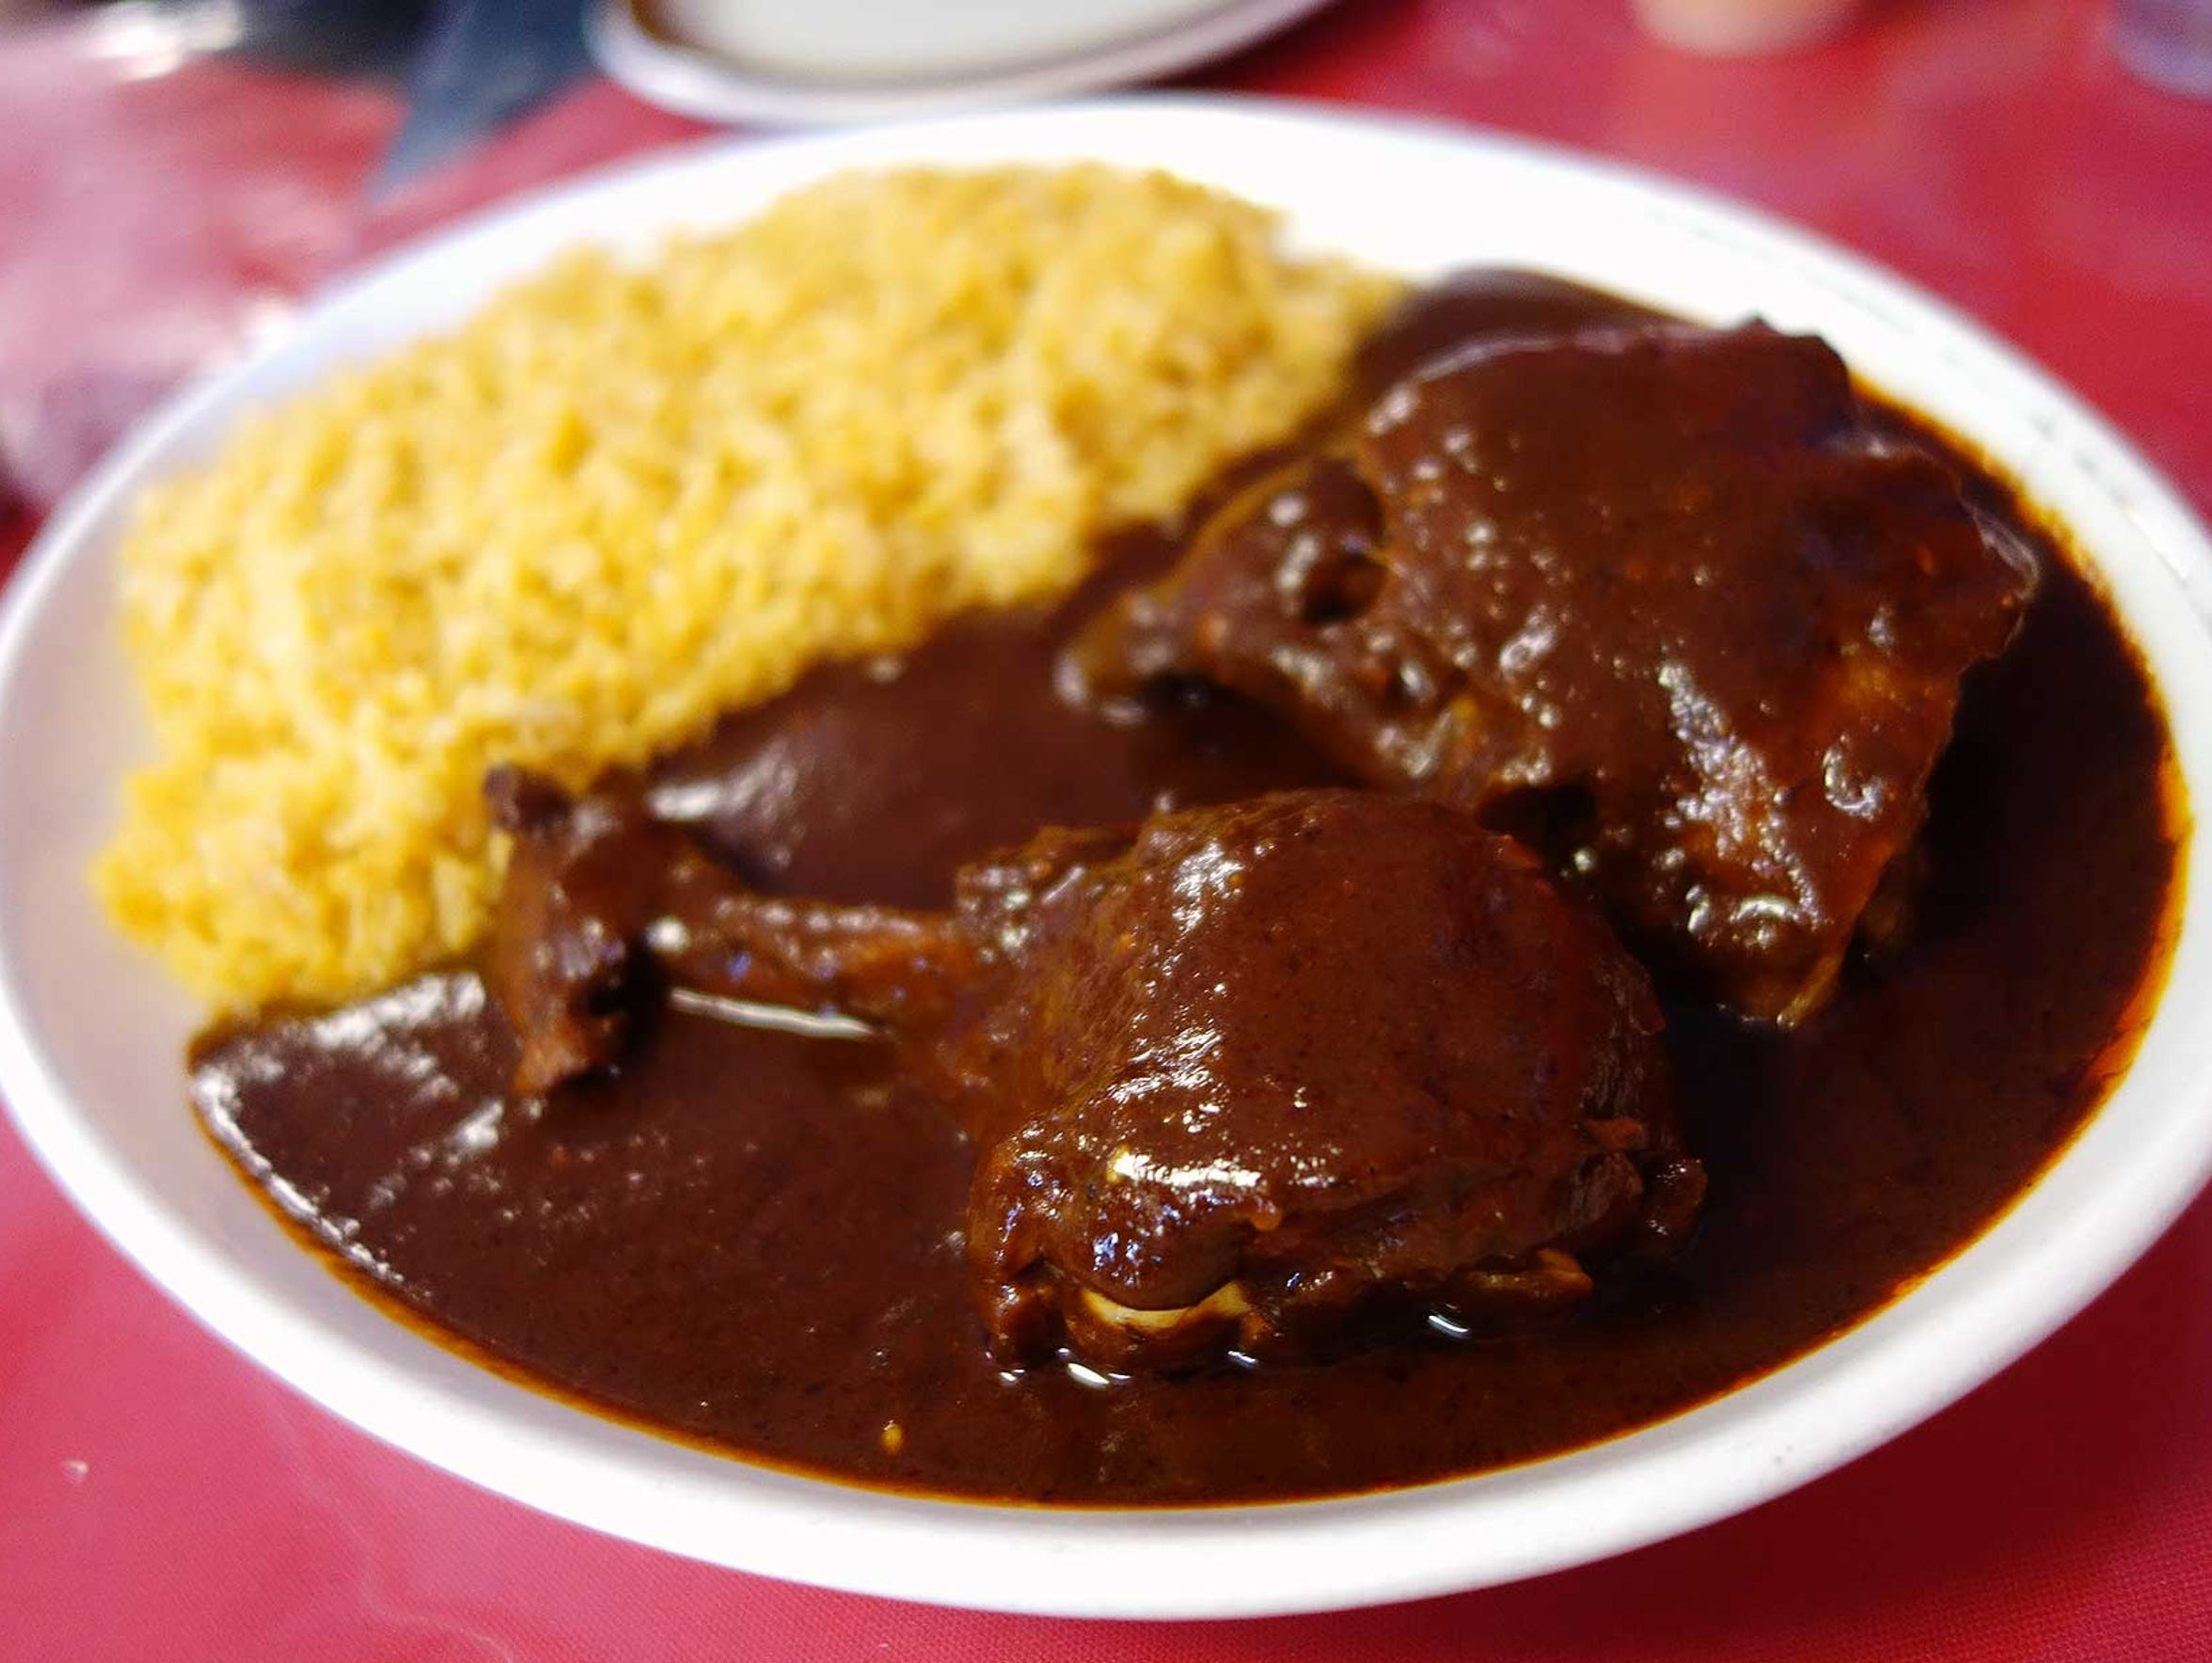 Chicken with mole poblano and rice at Restaurant Huauchinangos.